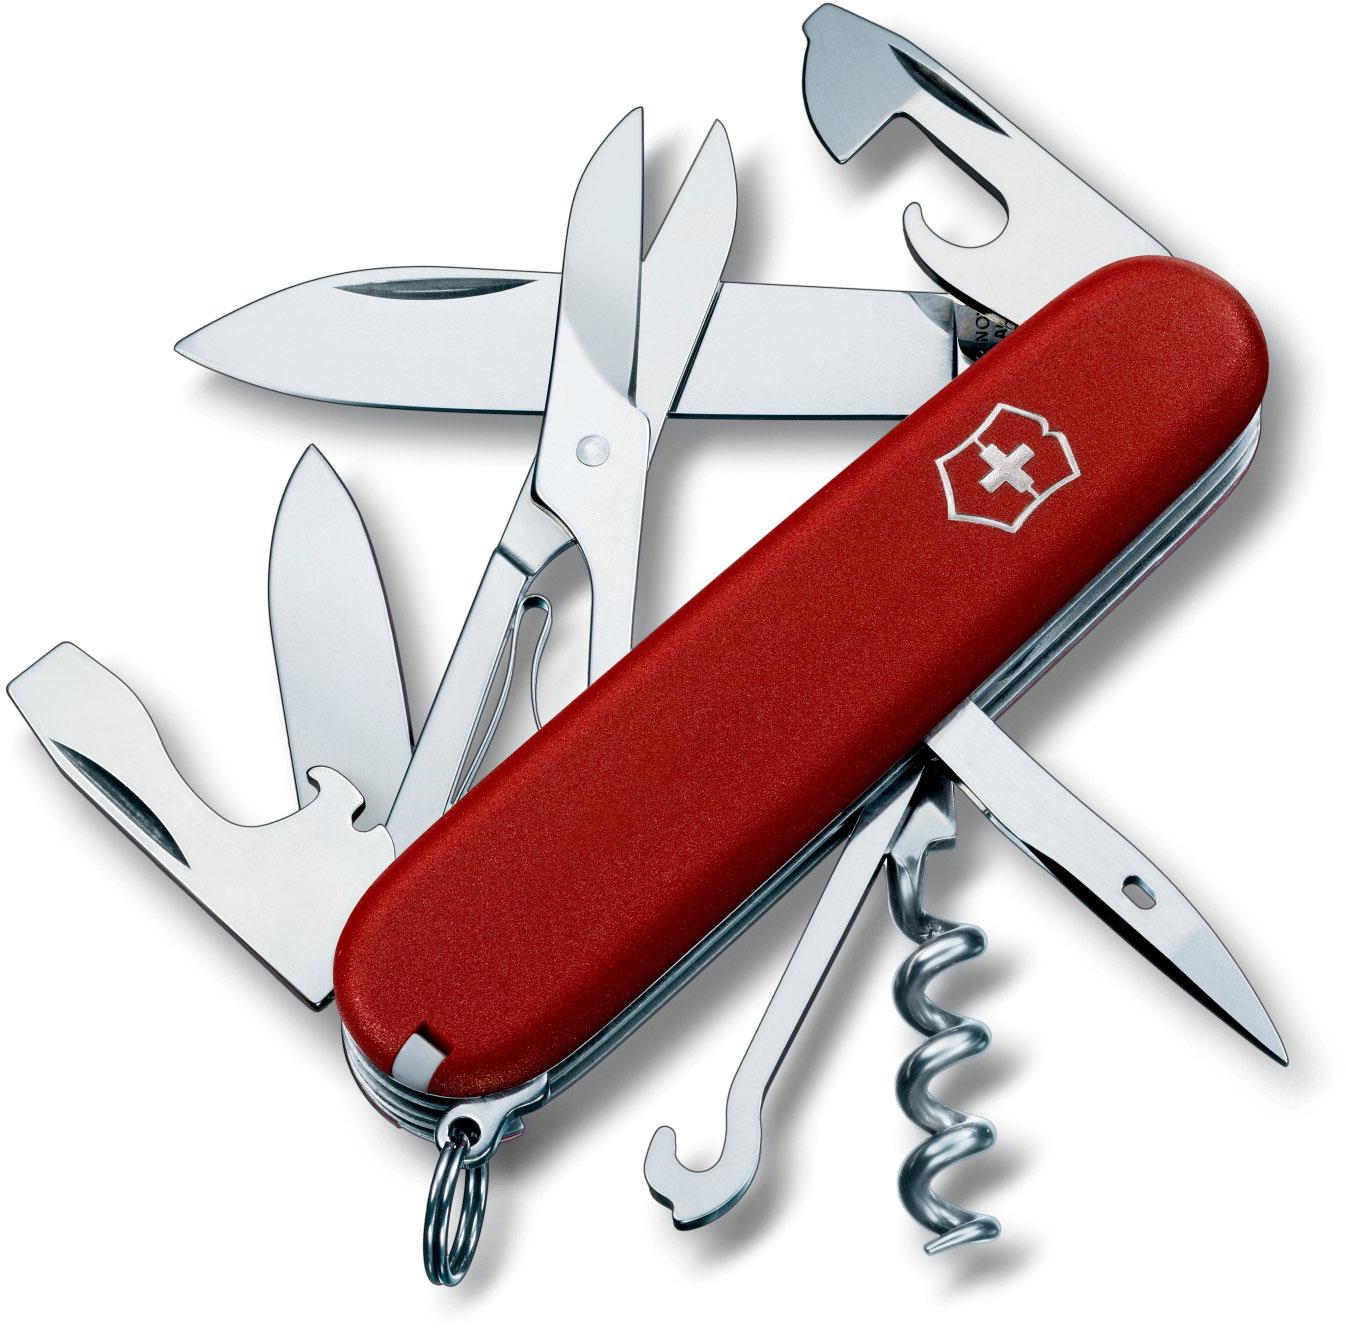 Victorinox Swiss Army Climber Multi-Tool, 3-1/2 inch Red Handles